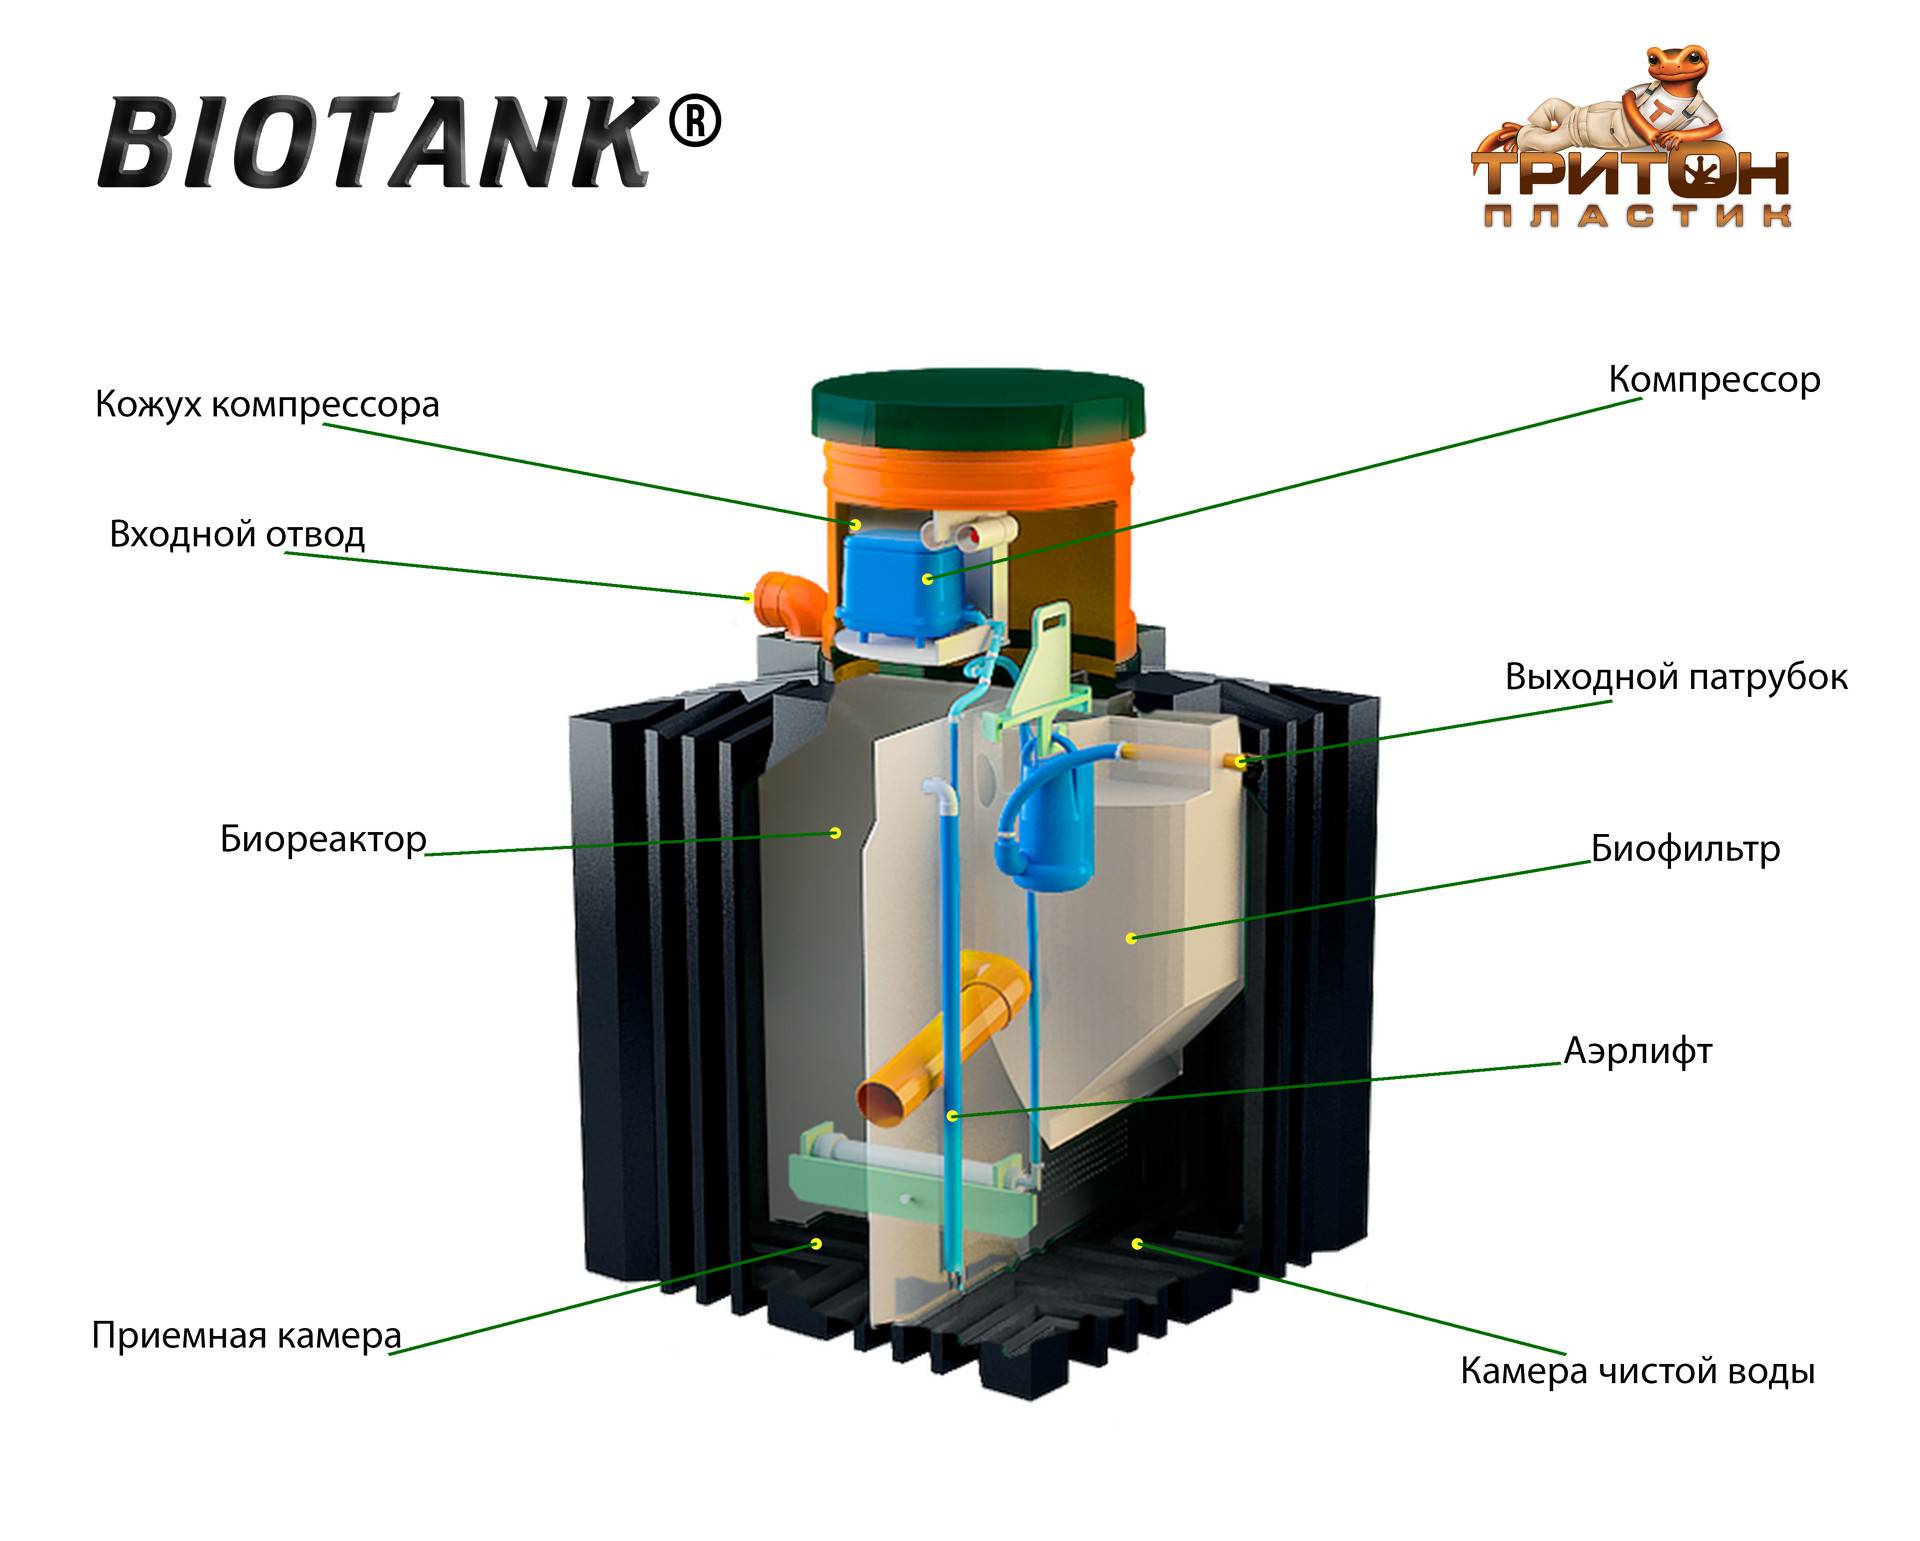 Септик биотанк 8: особенности и технические характеристики